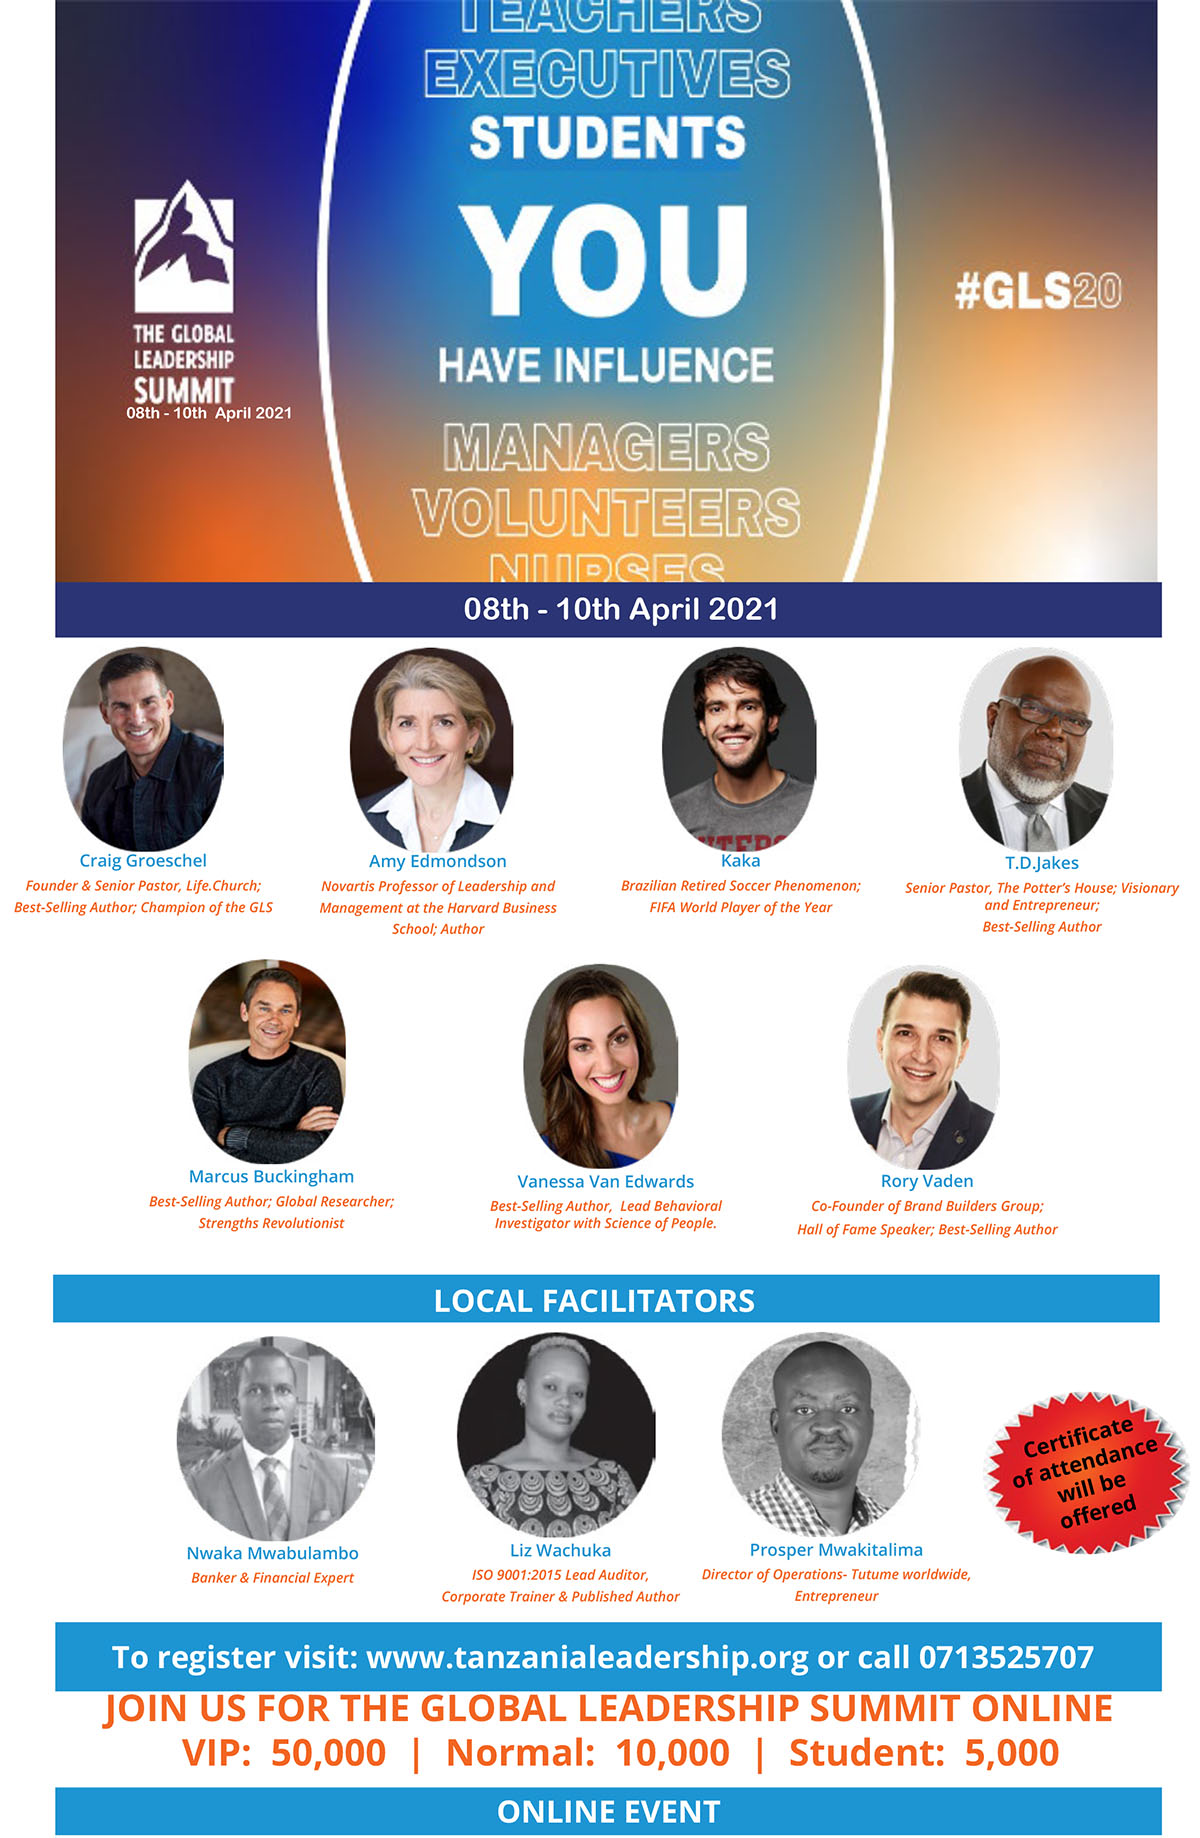 The-Global-Leadership-Summit-Attention-Managers-Volunteers-Nurses